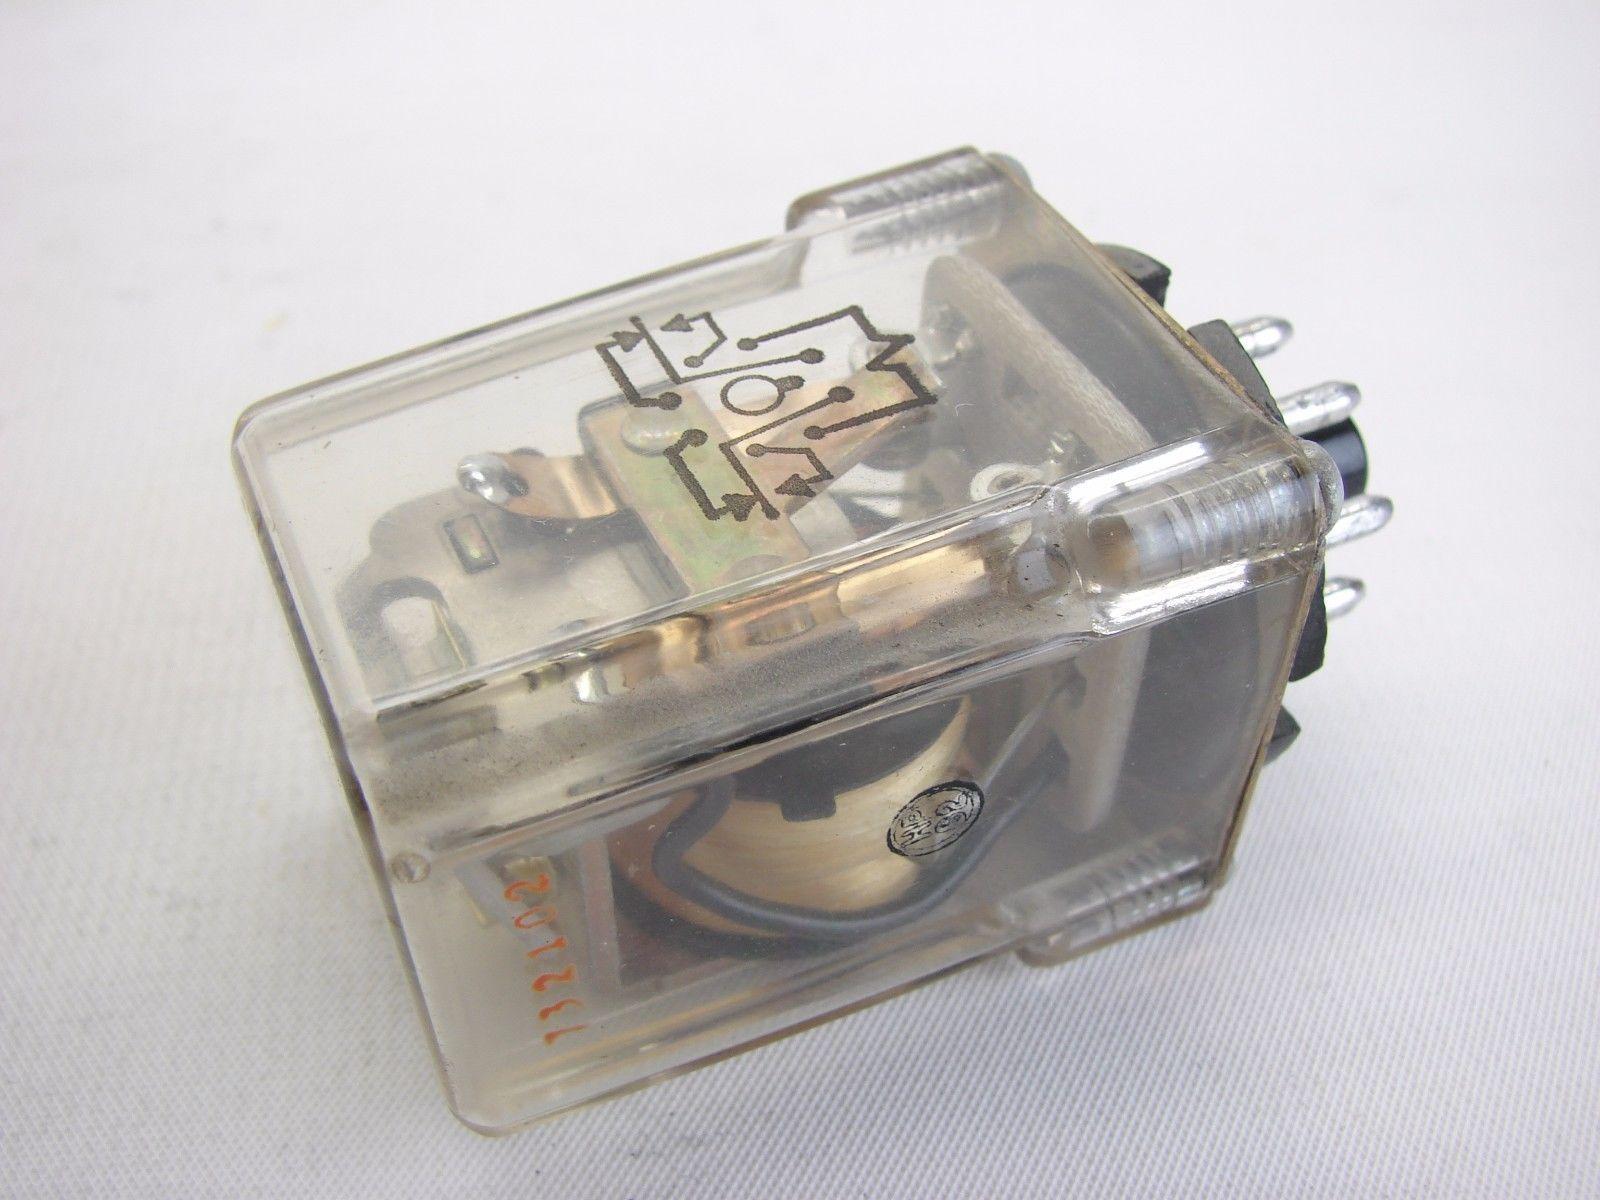 10A Socket Potter Brumfield KRP-11AG-120 7-1393101-7 Power Relay 120VAC DPDT